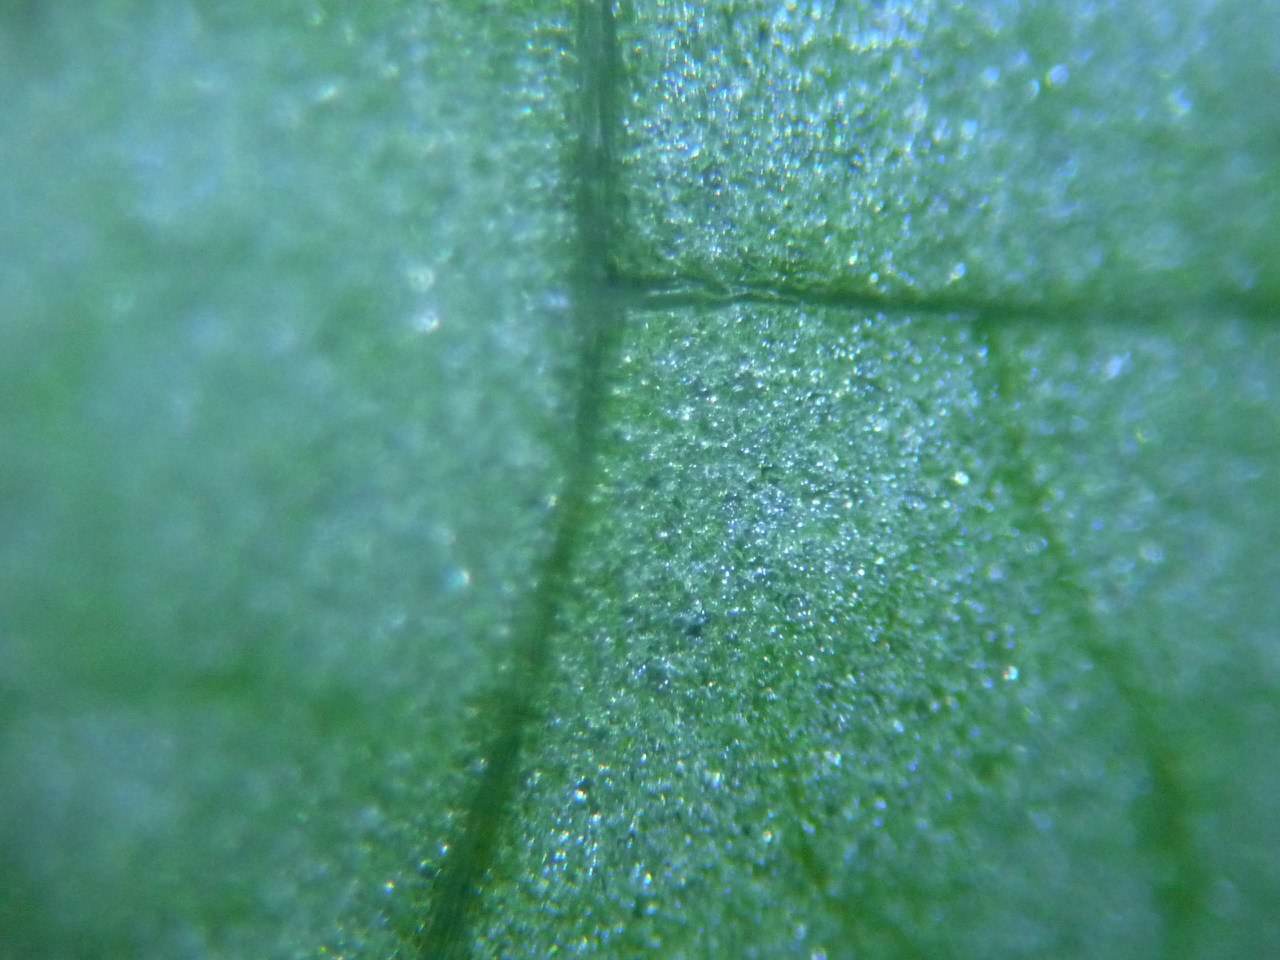 Лист салата под микроскопом